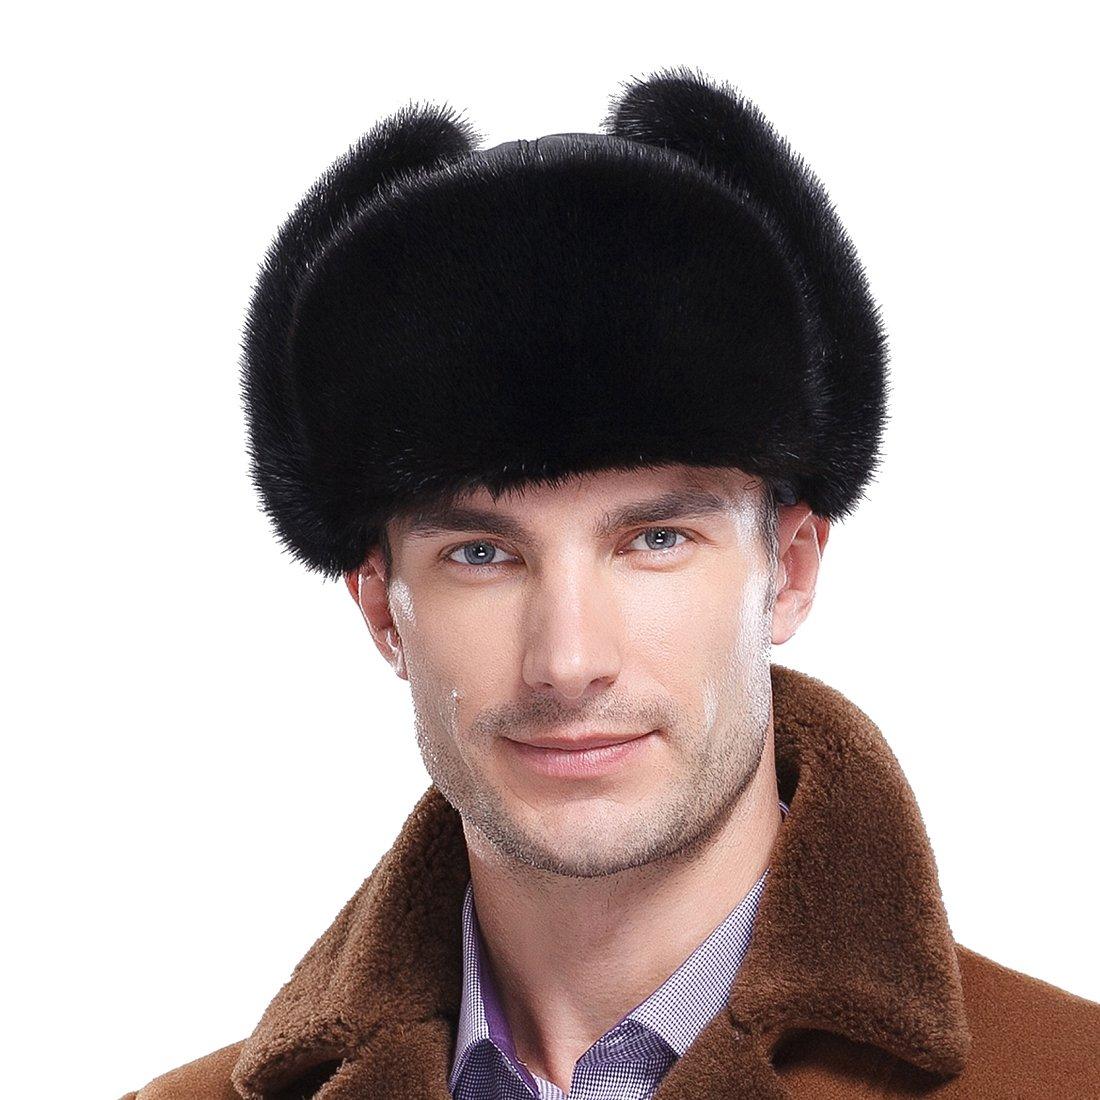 URSFUR Classic Men's Mink Fur & Leather Russian Ushanka Hats (One Size, Black)